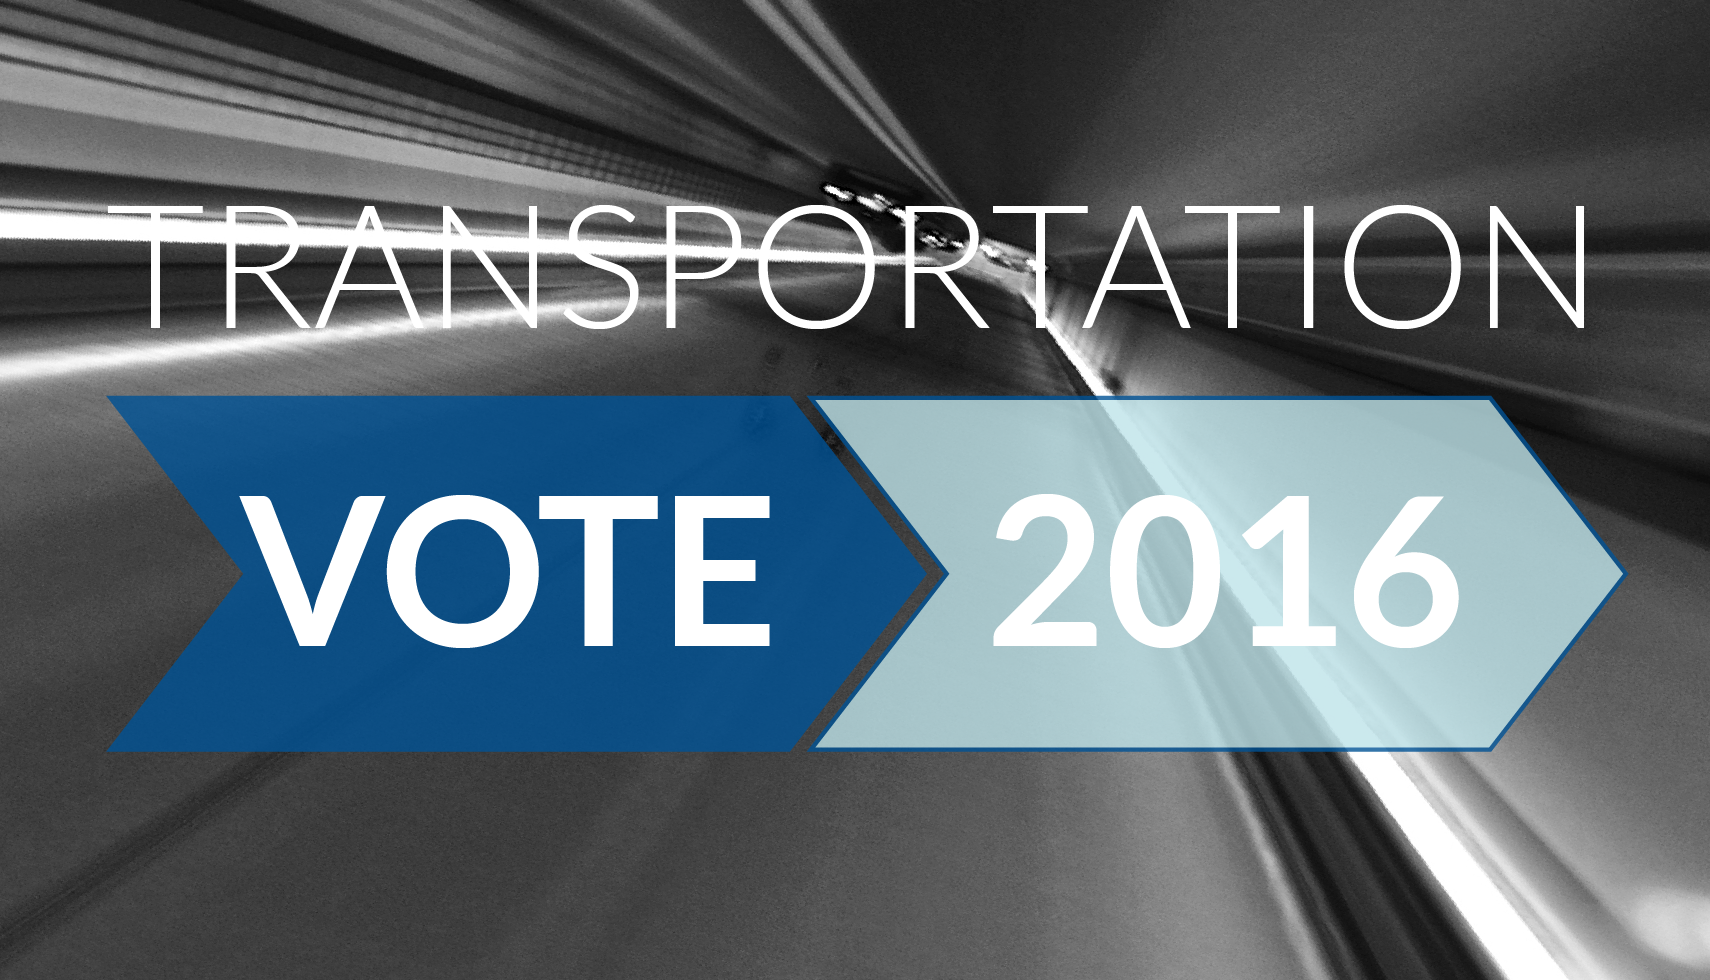 Transportation Vote 2016